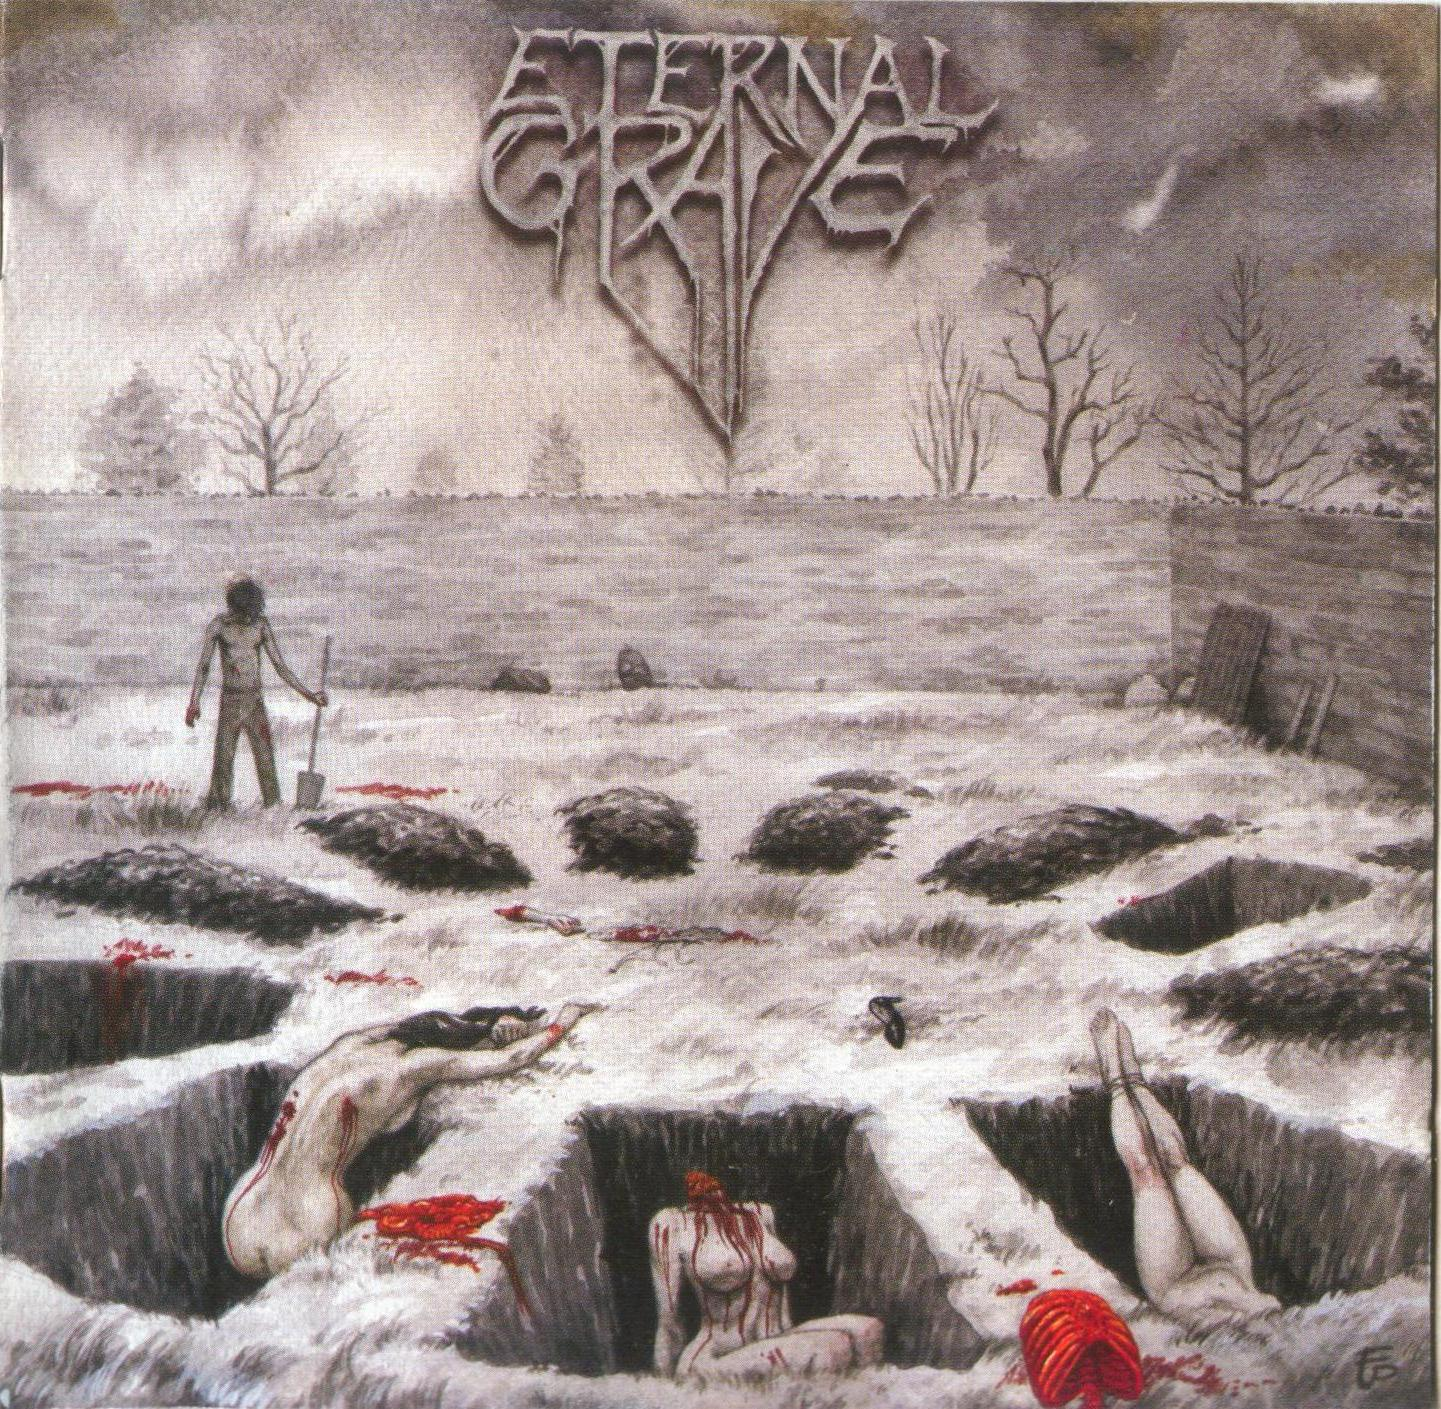 Eternal grave arquitectura del horror 2009 death metal for Cabine del torrente grave